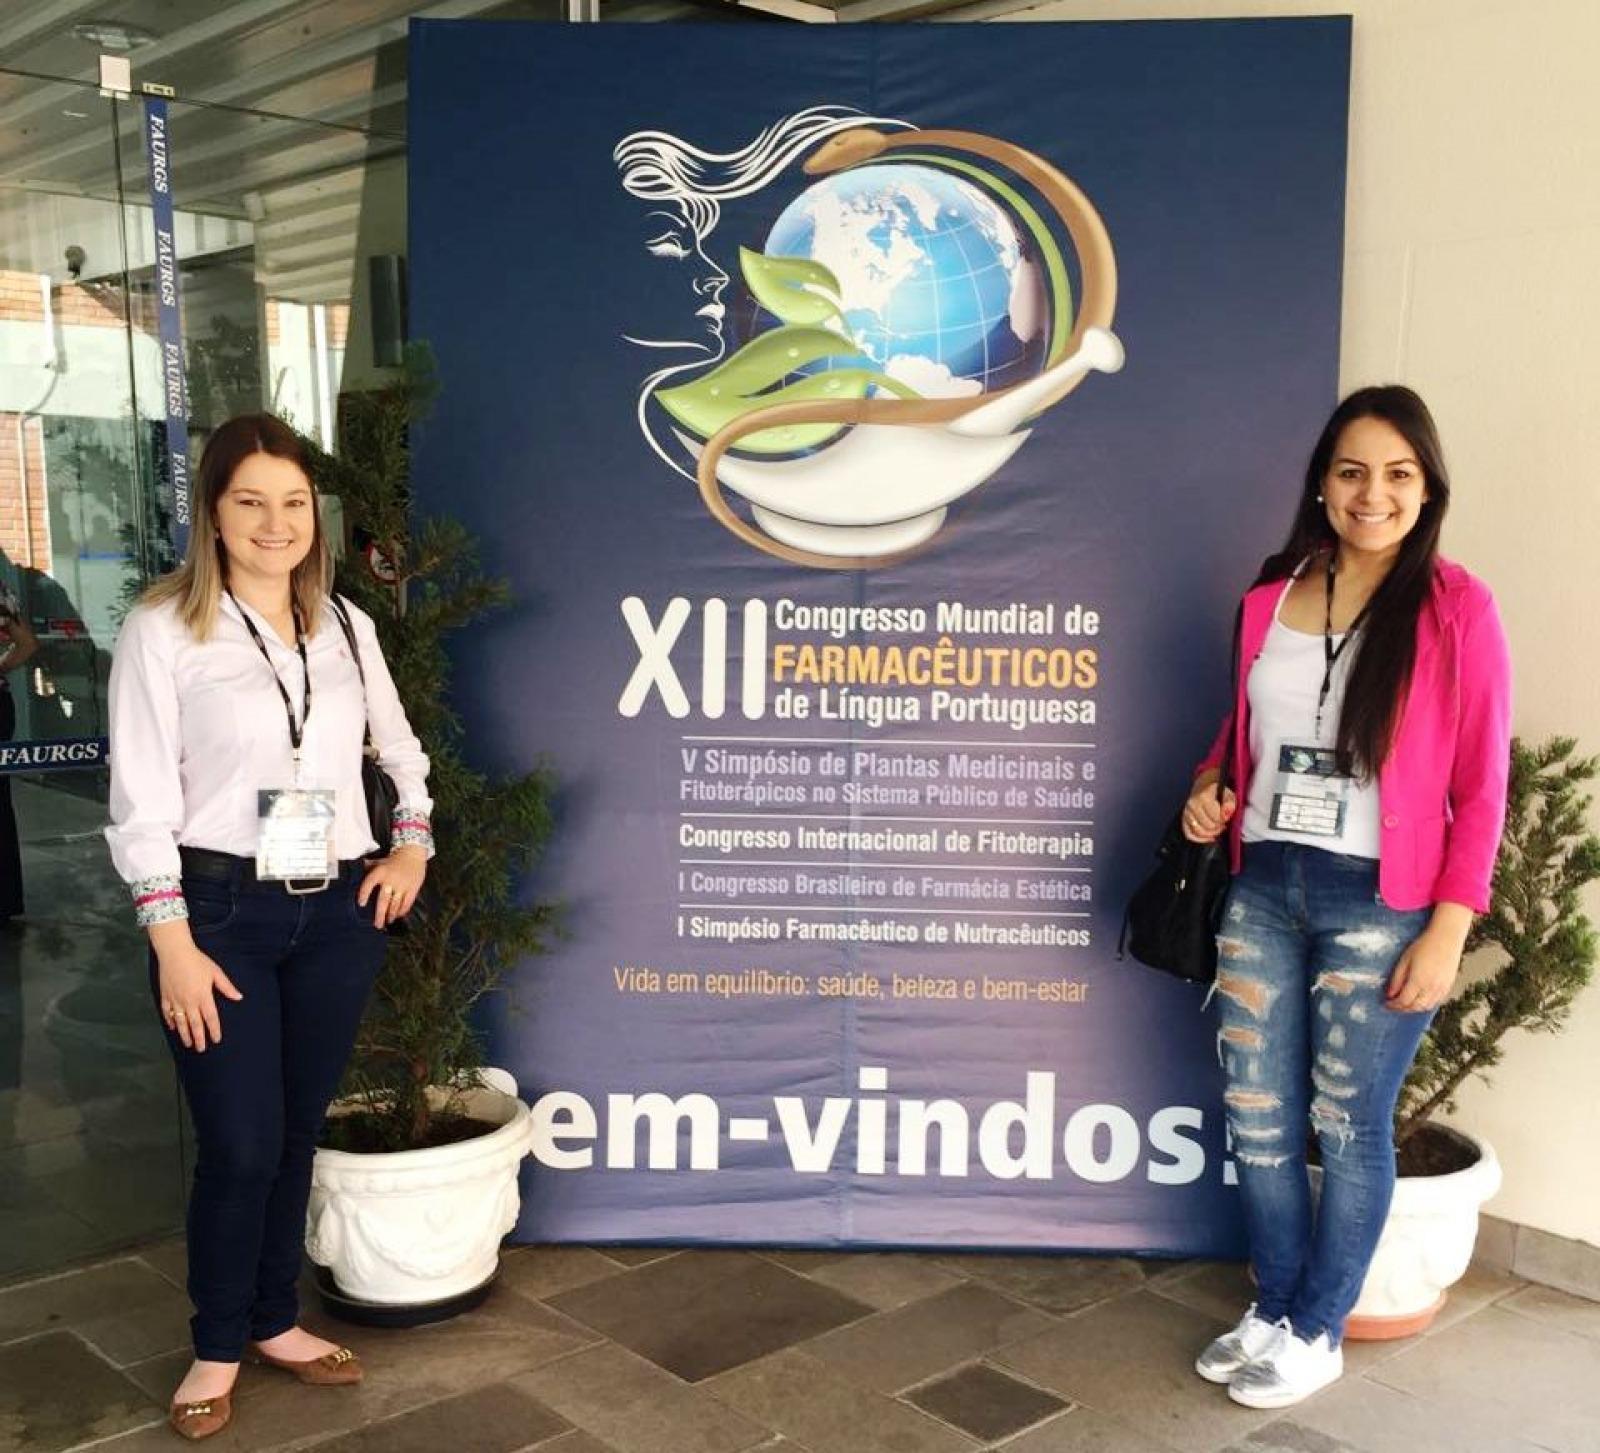 XII Congresso Mundial de Farmacêuticos de Língua Portuguesa